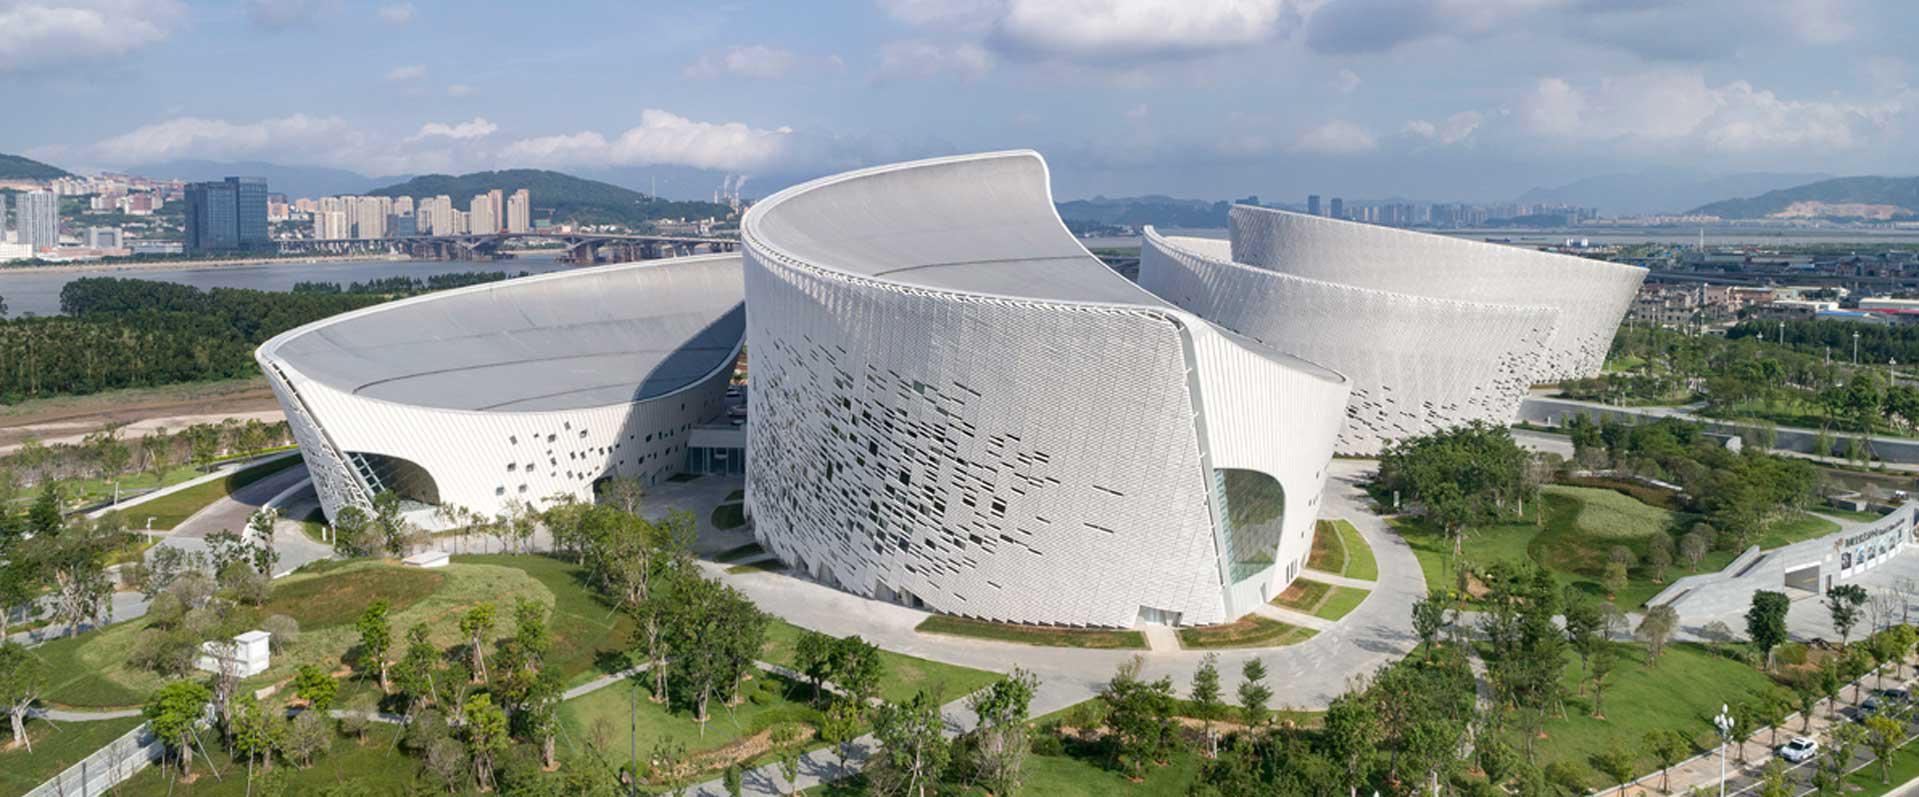 1-strait-culture-and-art-center-fuzhou-china-pes-architects-new-78